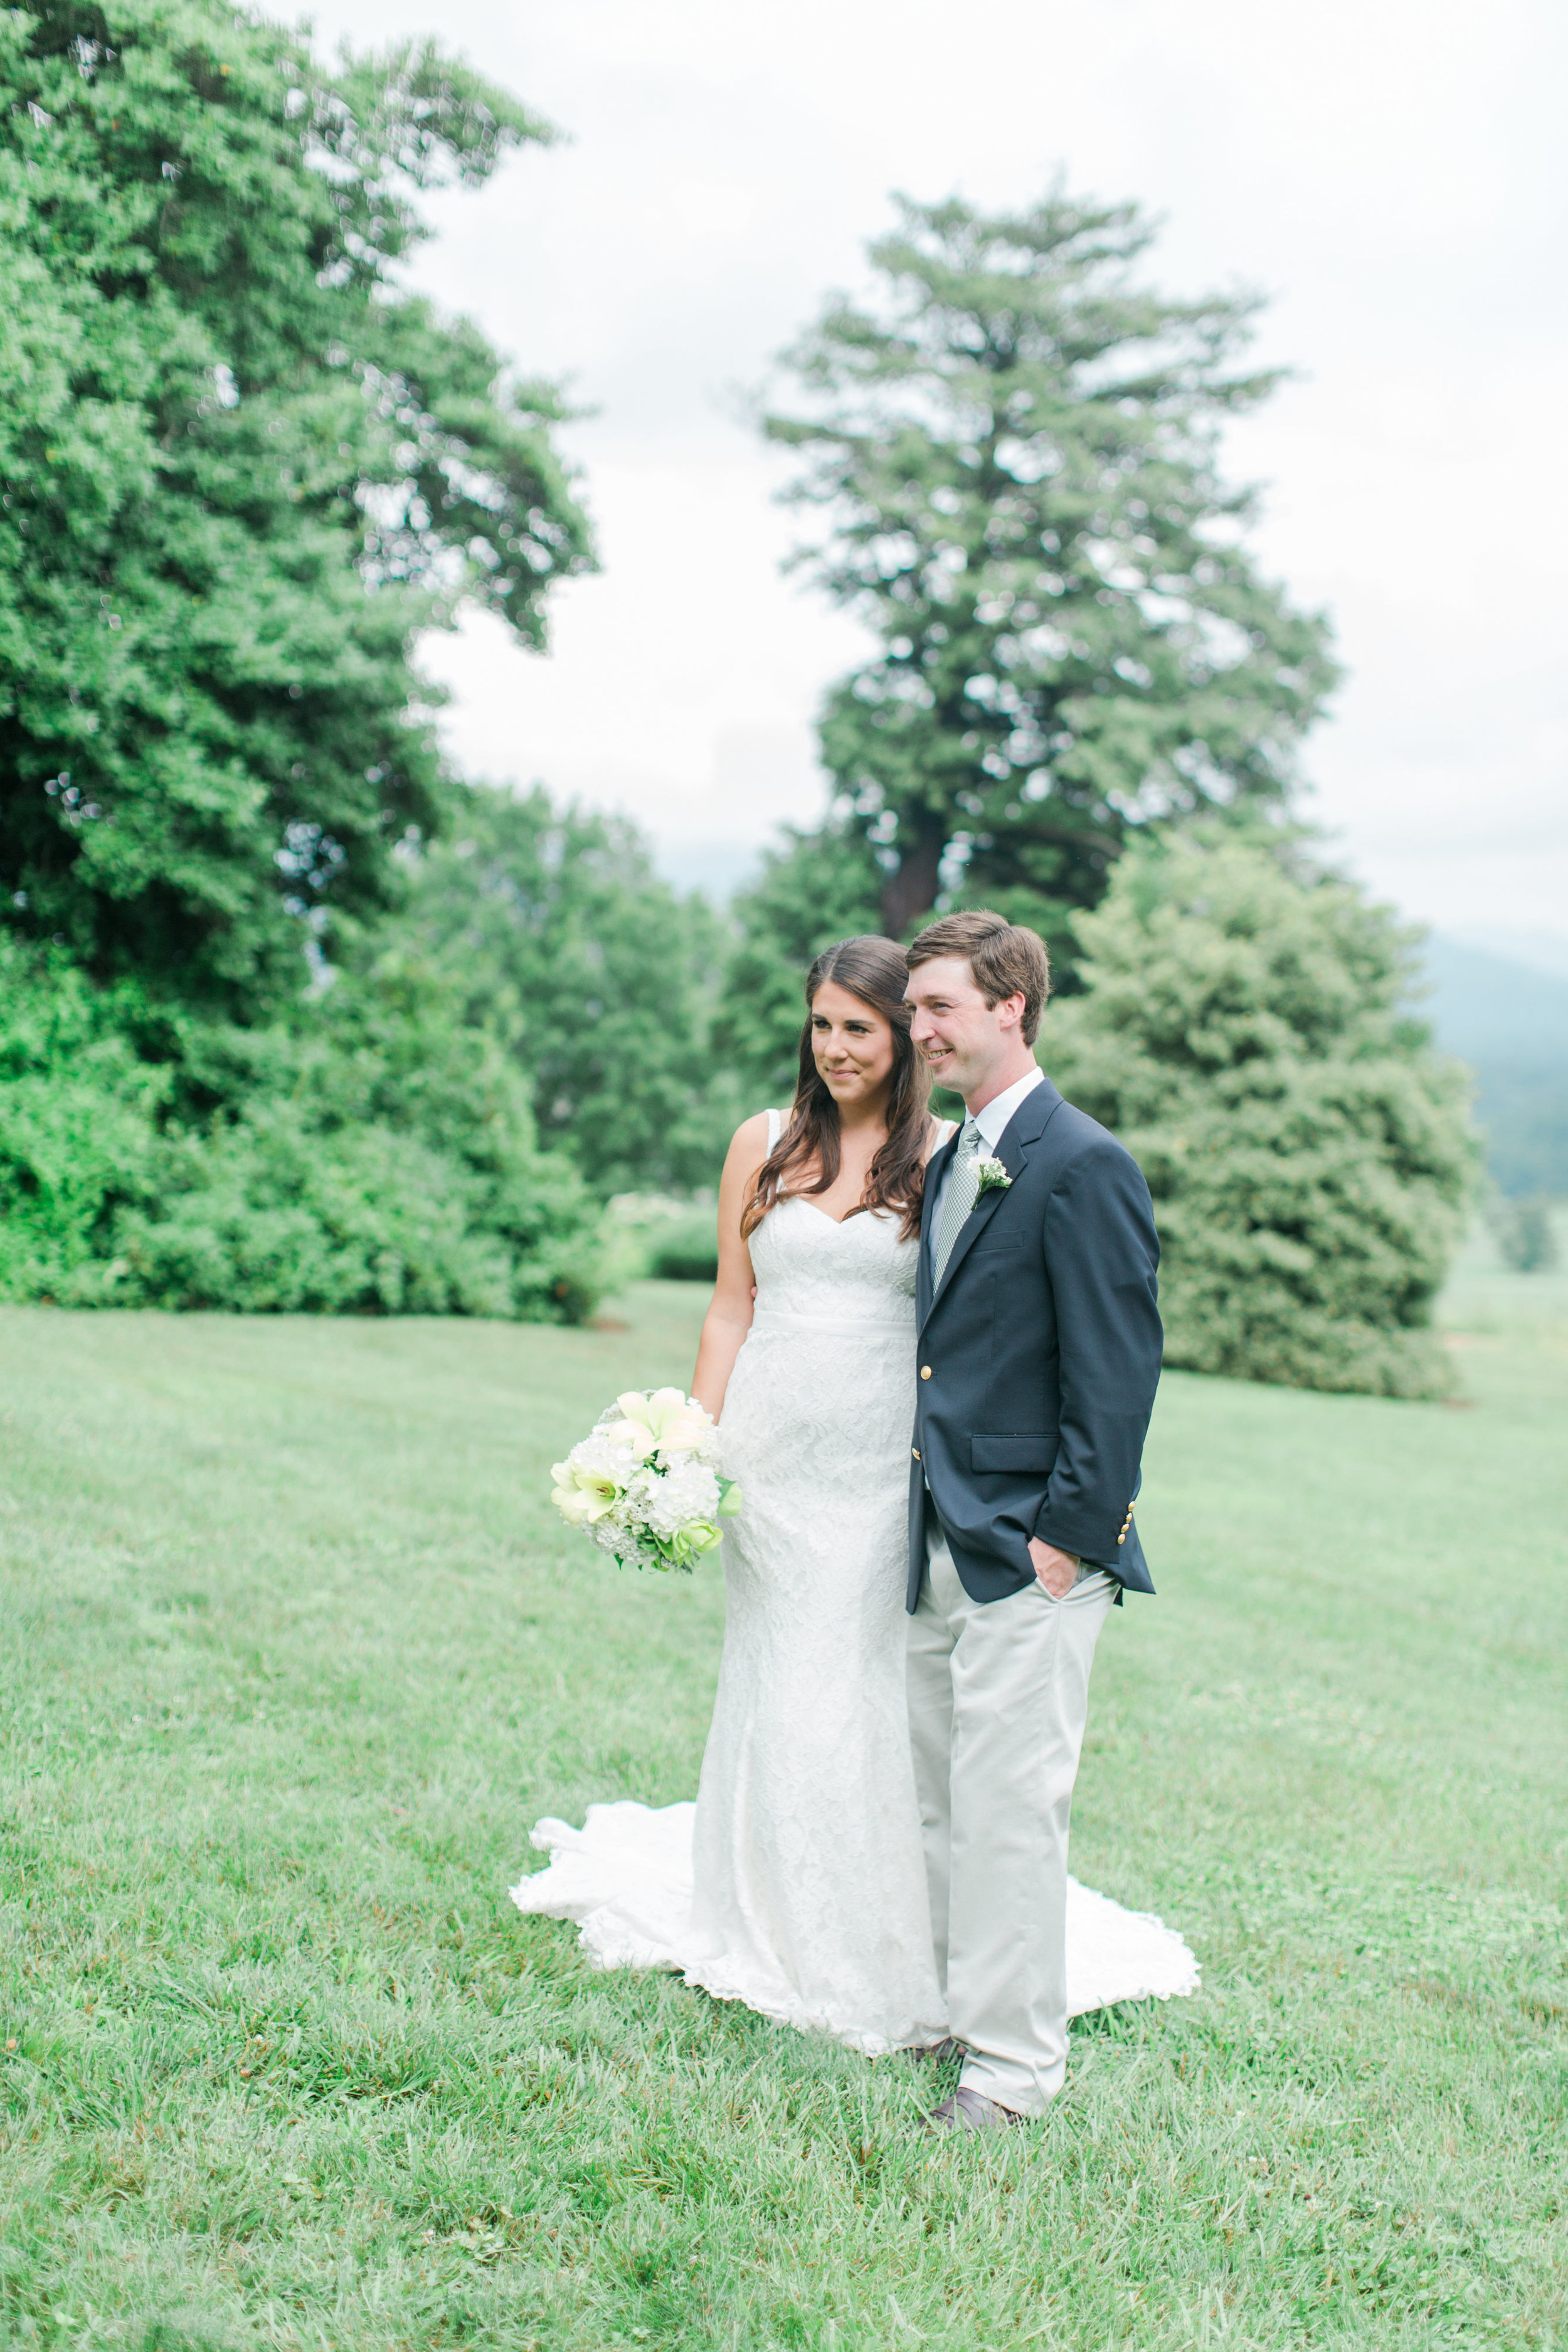 062715-Hannah+Drew-pharsalia-wedding-kathryn-ivy-photography-59.jpg